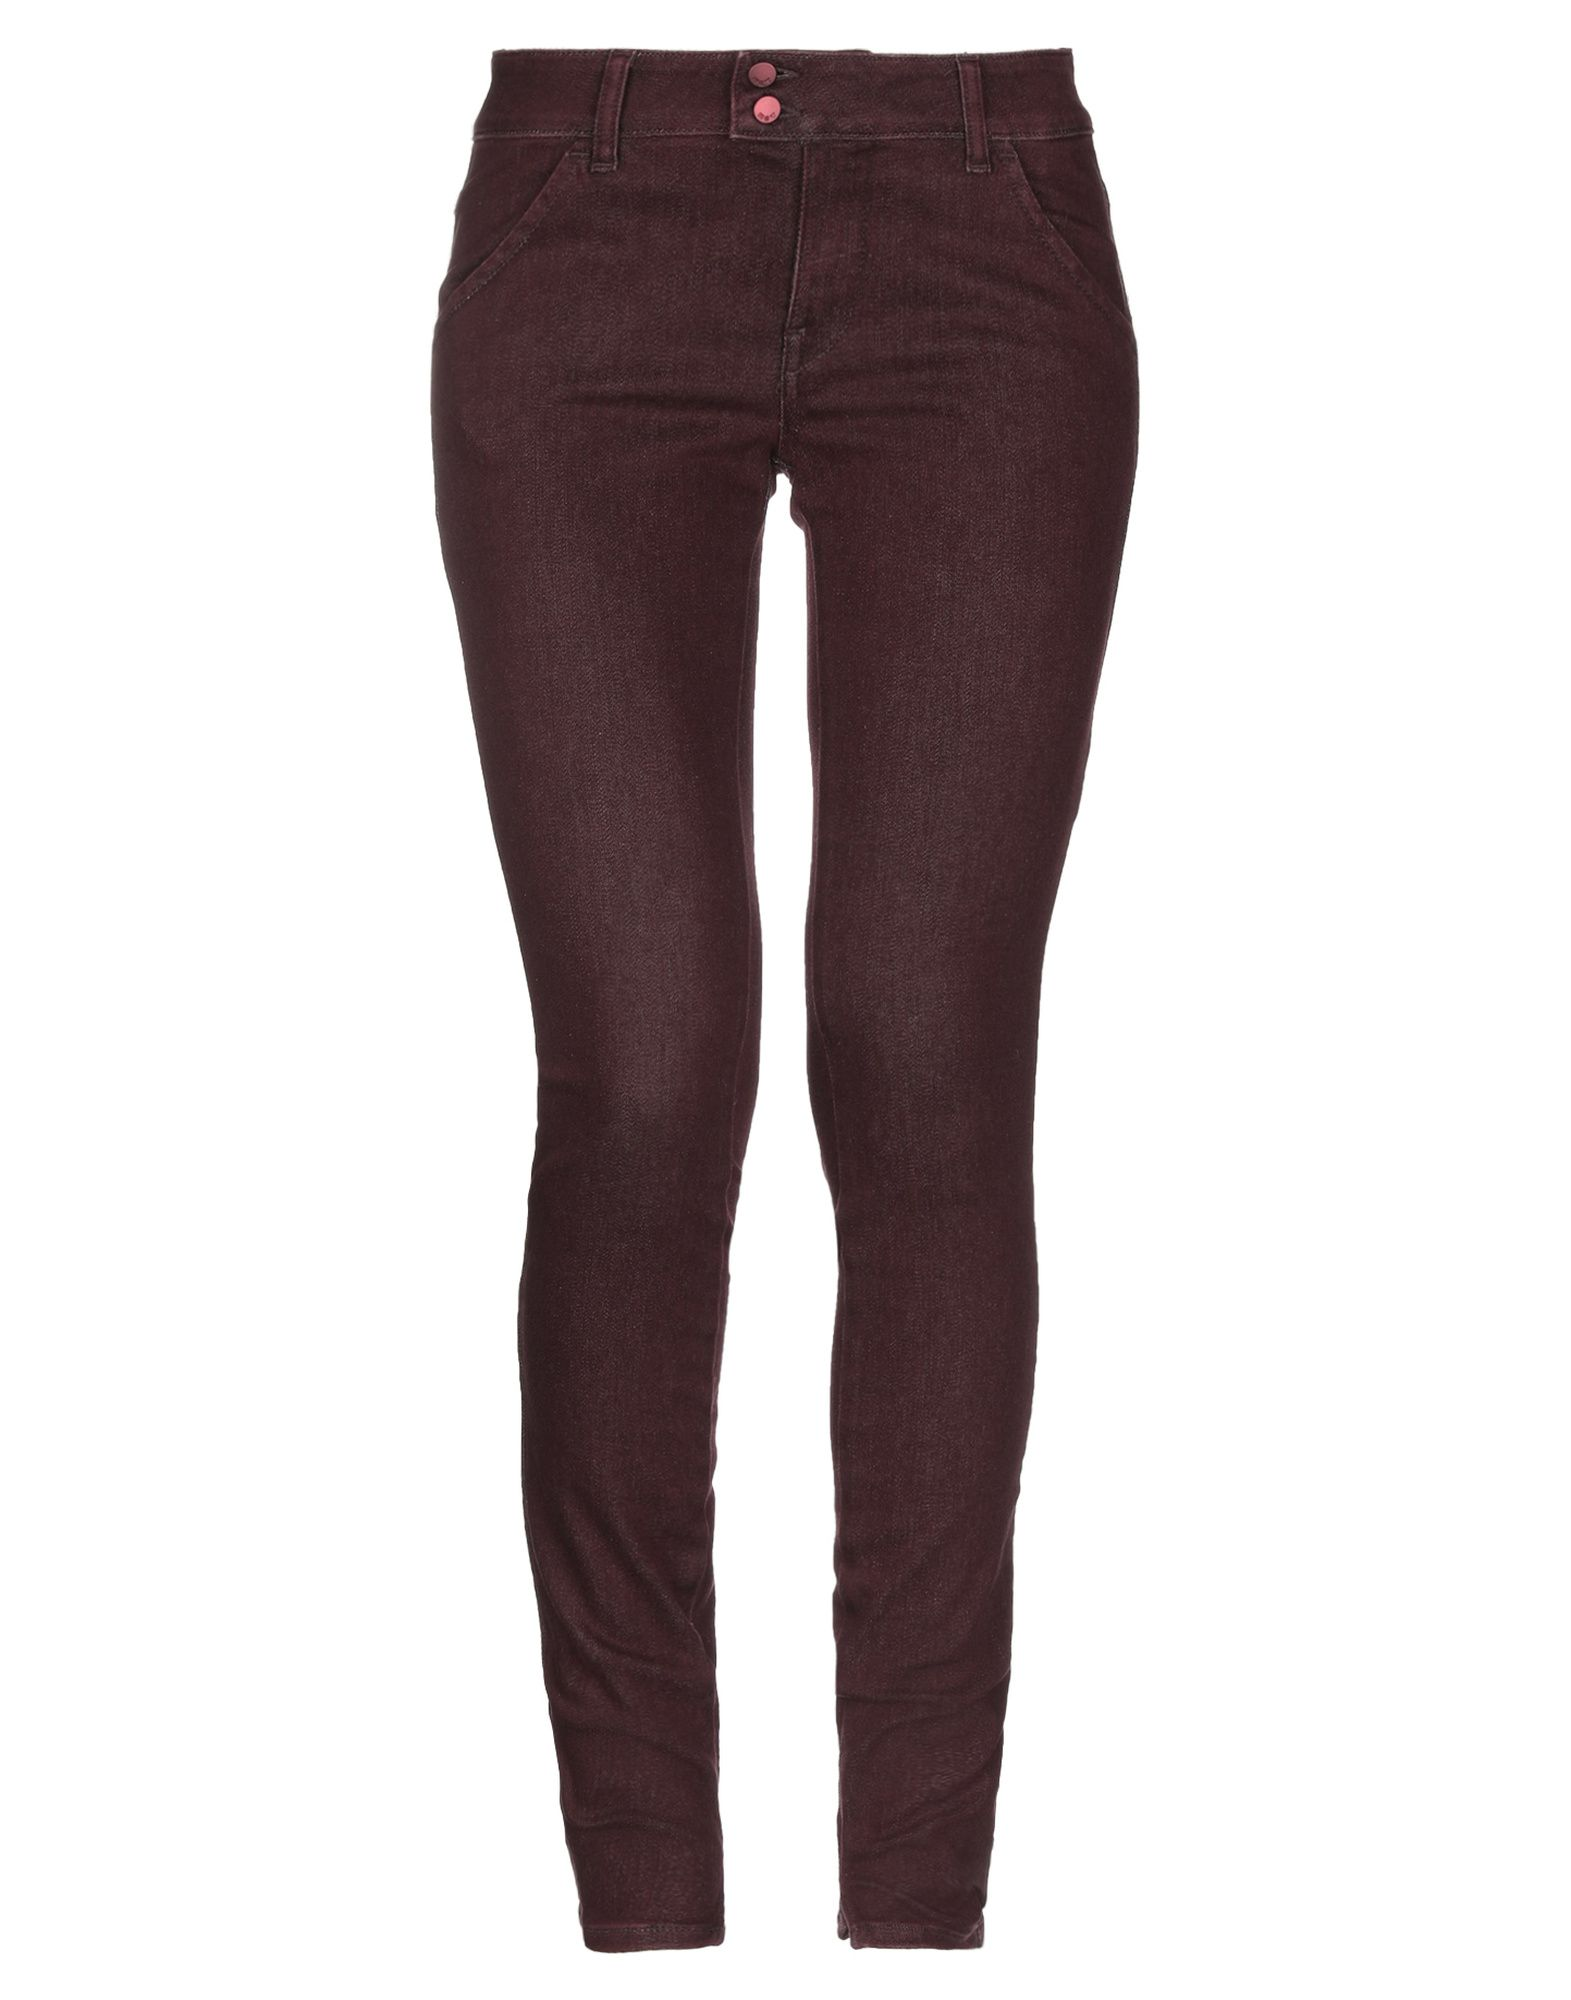 MET & FRIENDS Джинсовые брюки